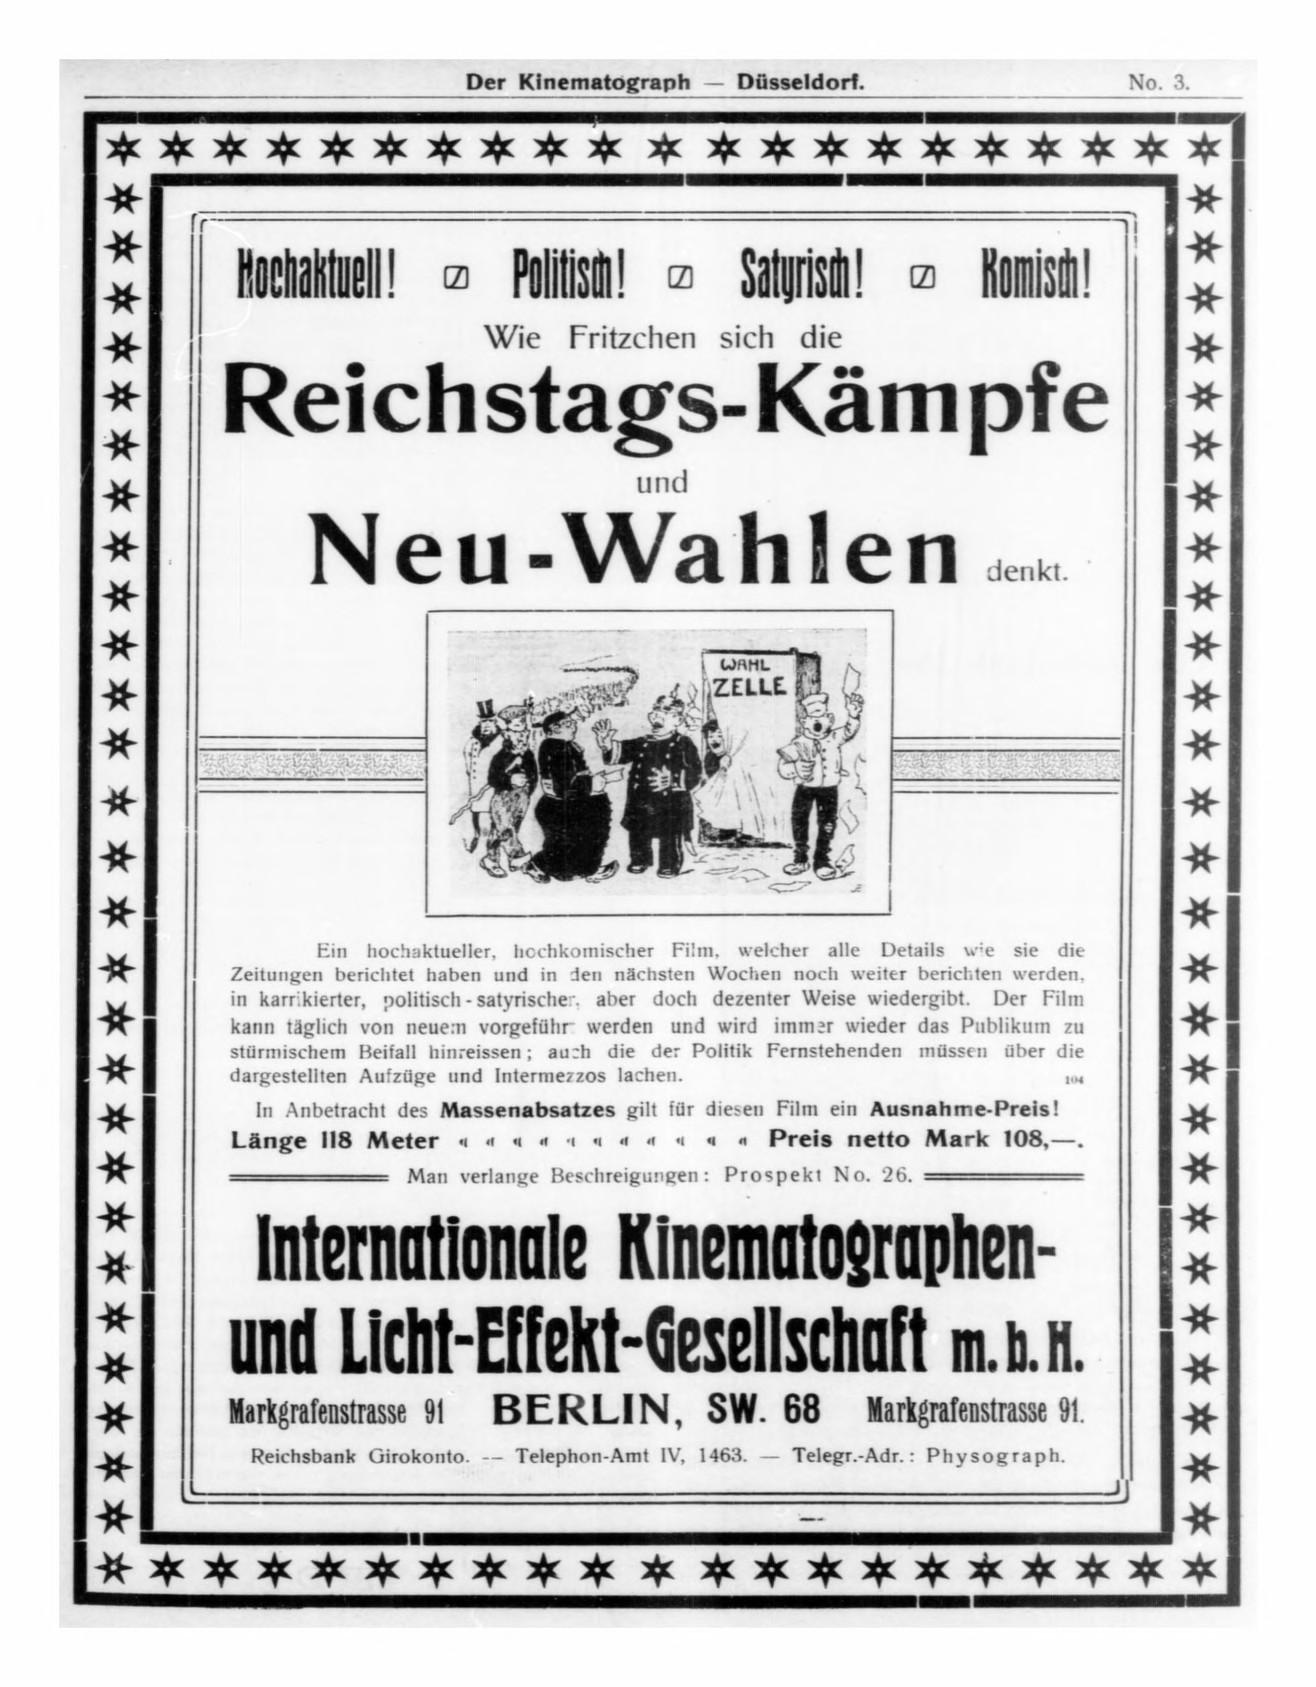 Kinematograph01-1907-01_jp2.zip&file=kinematograph01-1907-01_jp2%2fkinematograph01-1907-01_0026